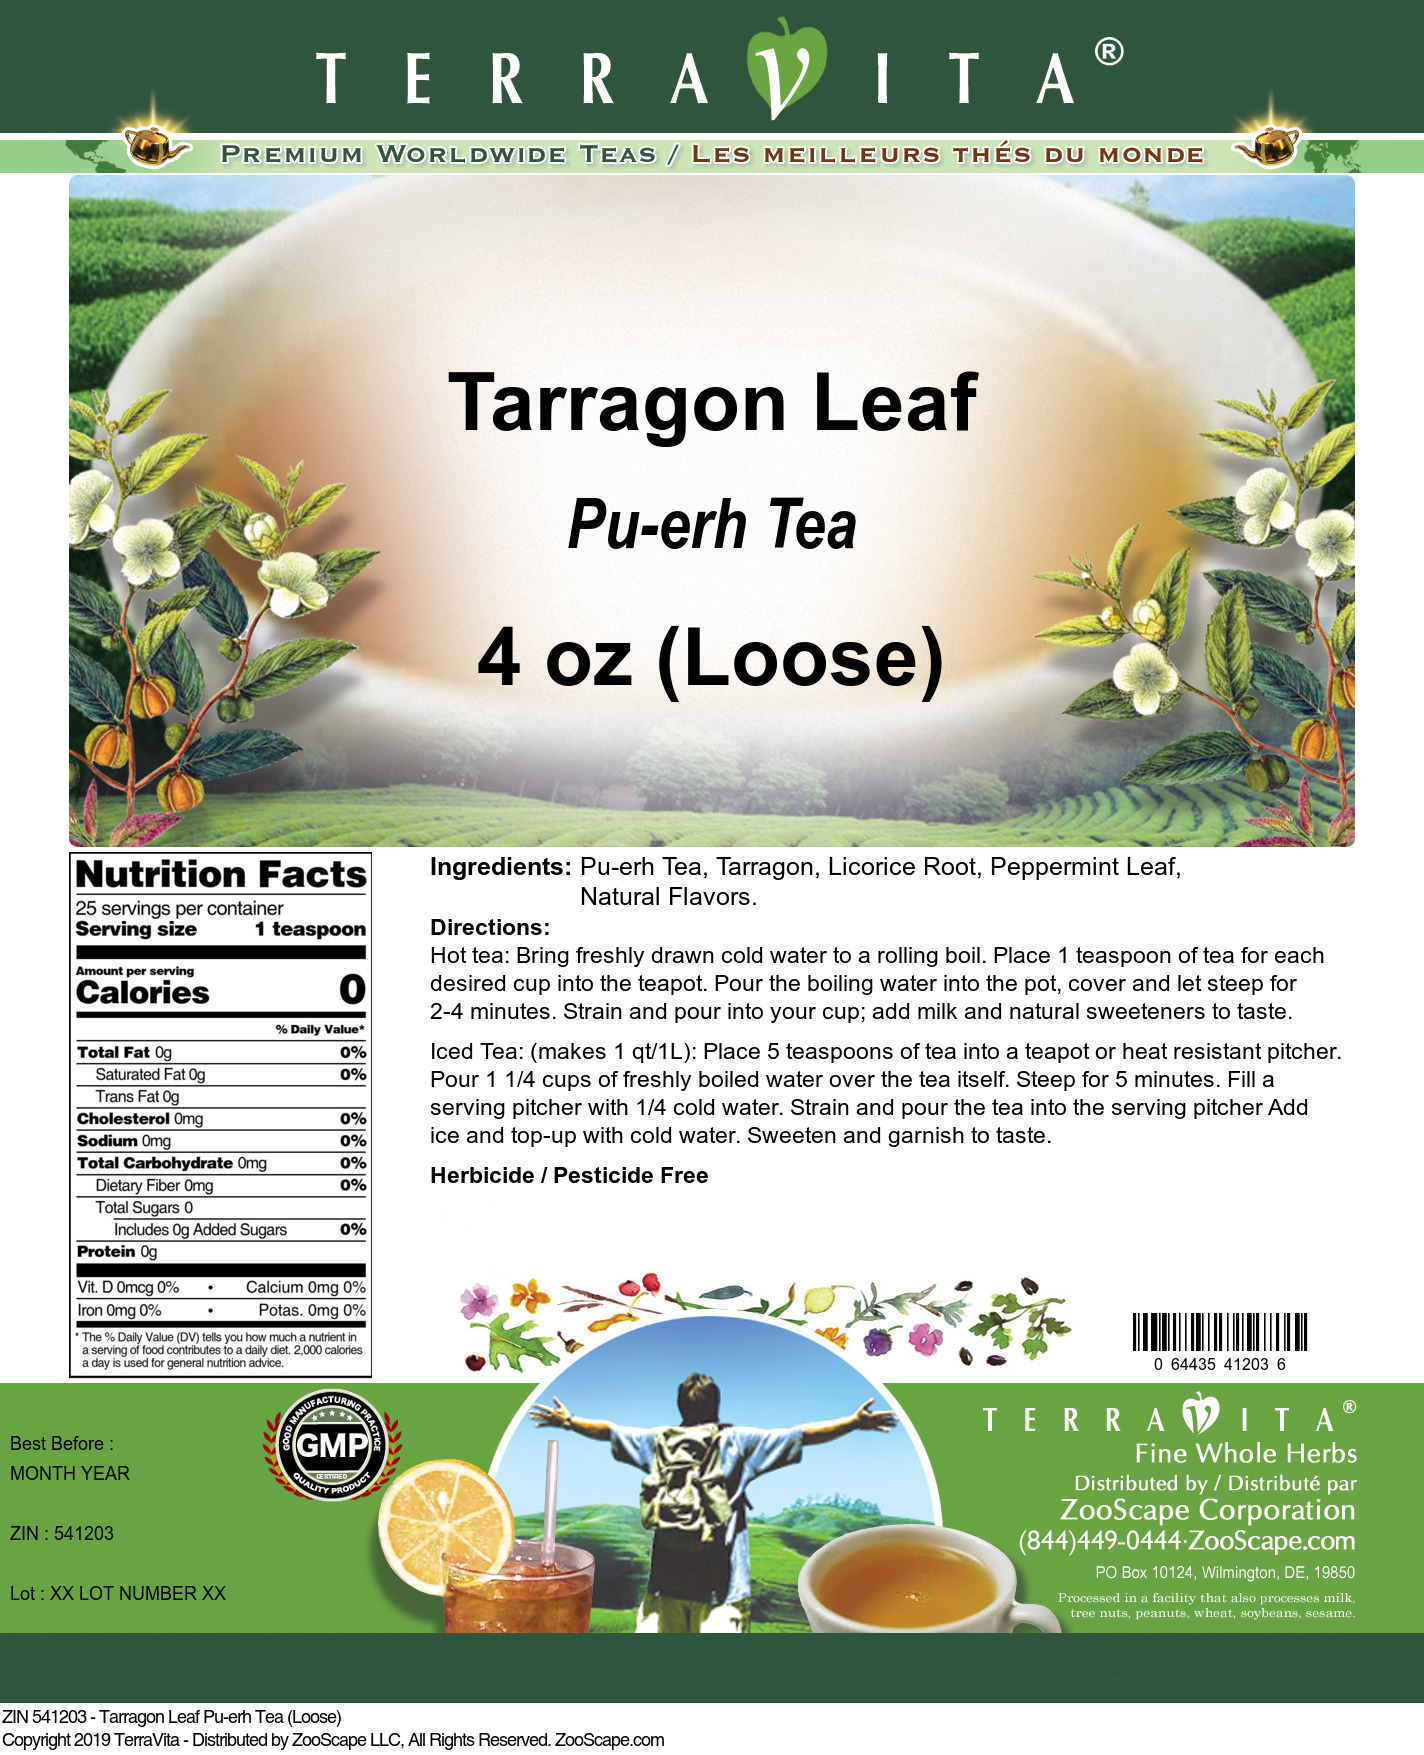 Tarragon Leaf Pu-erh Tea